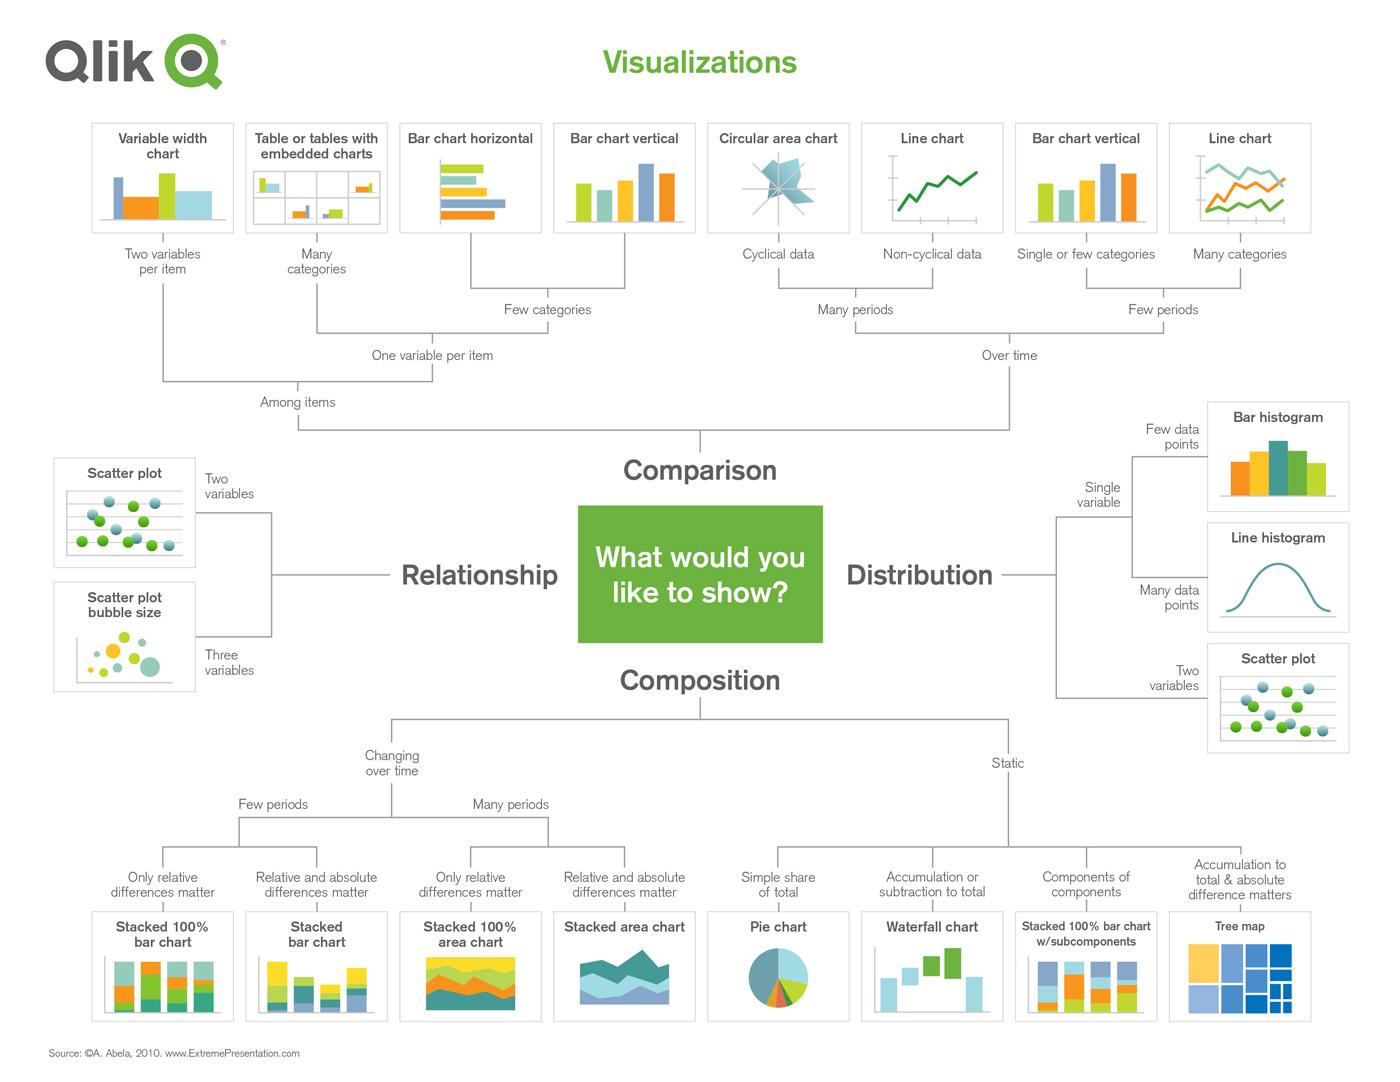 Climber Qlik Visualizations